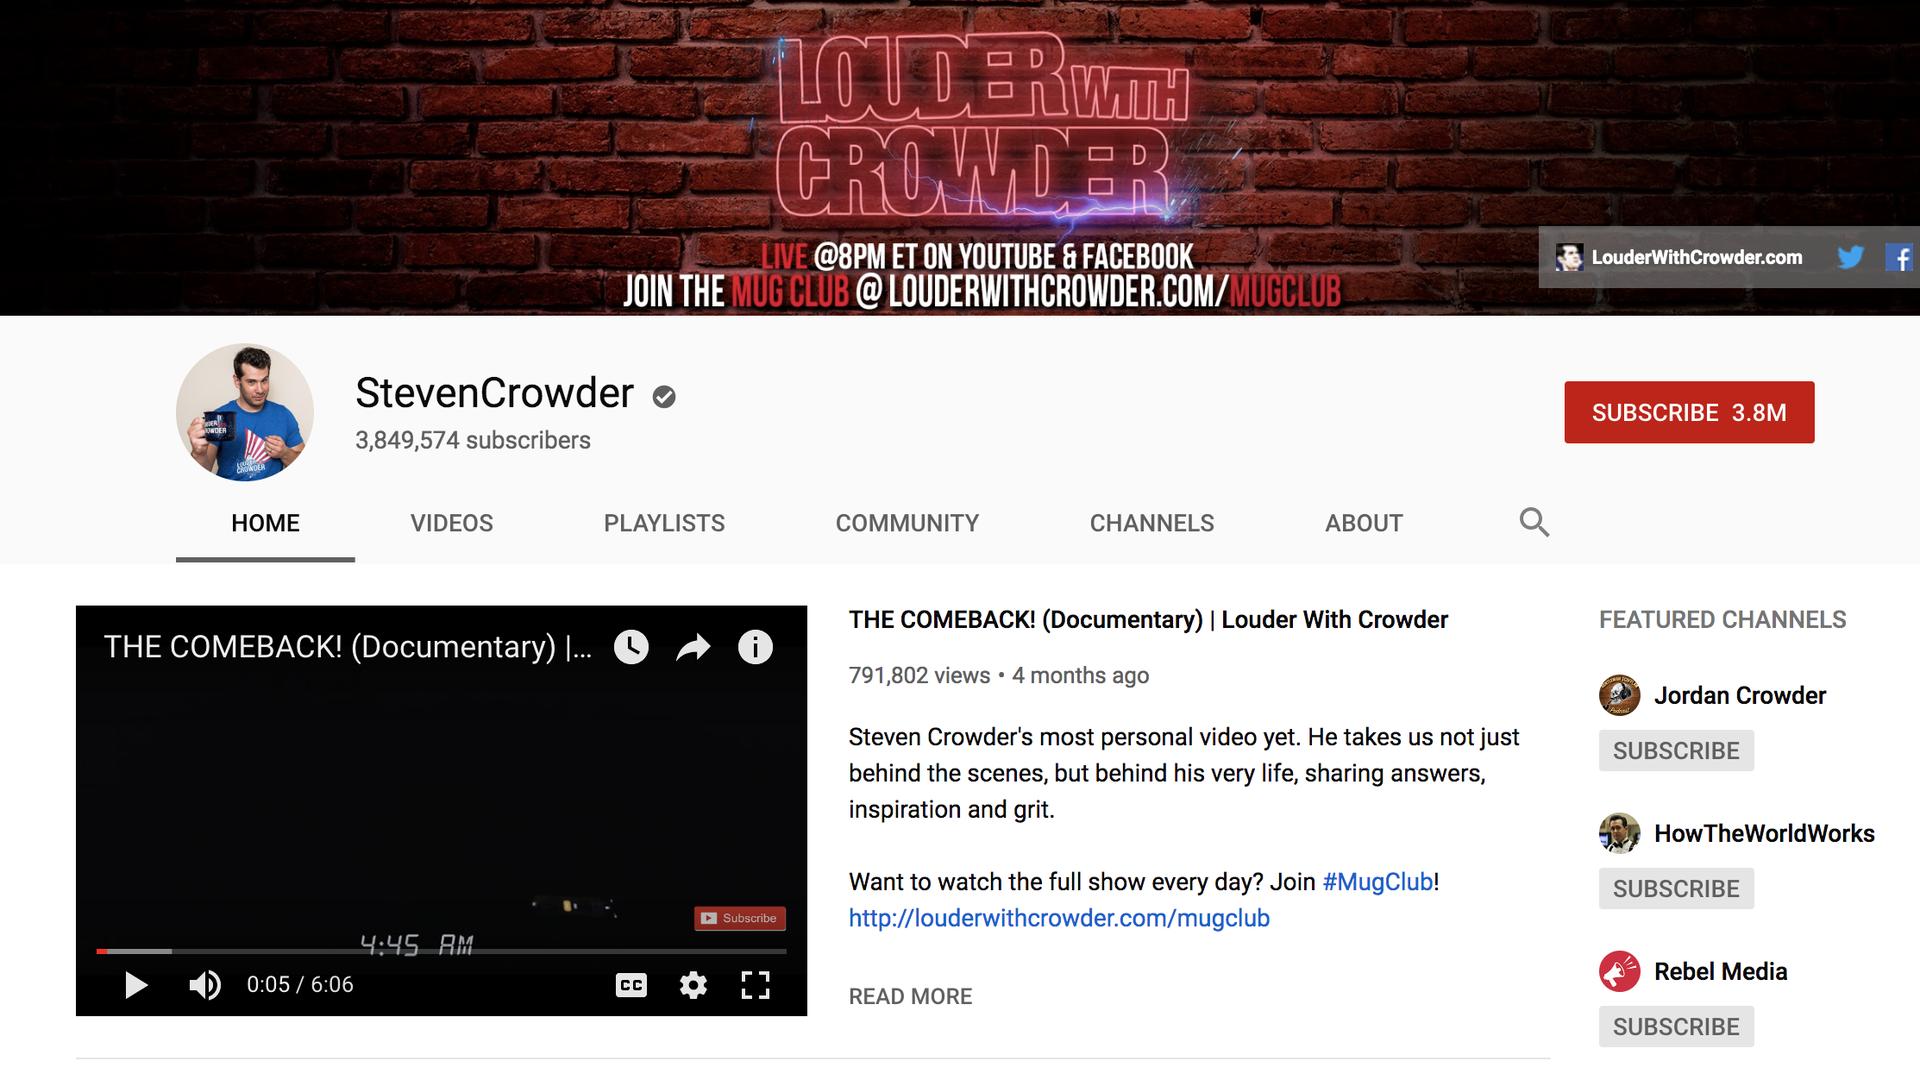 Steven Crowder's YouTube channel